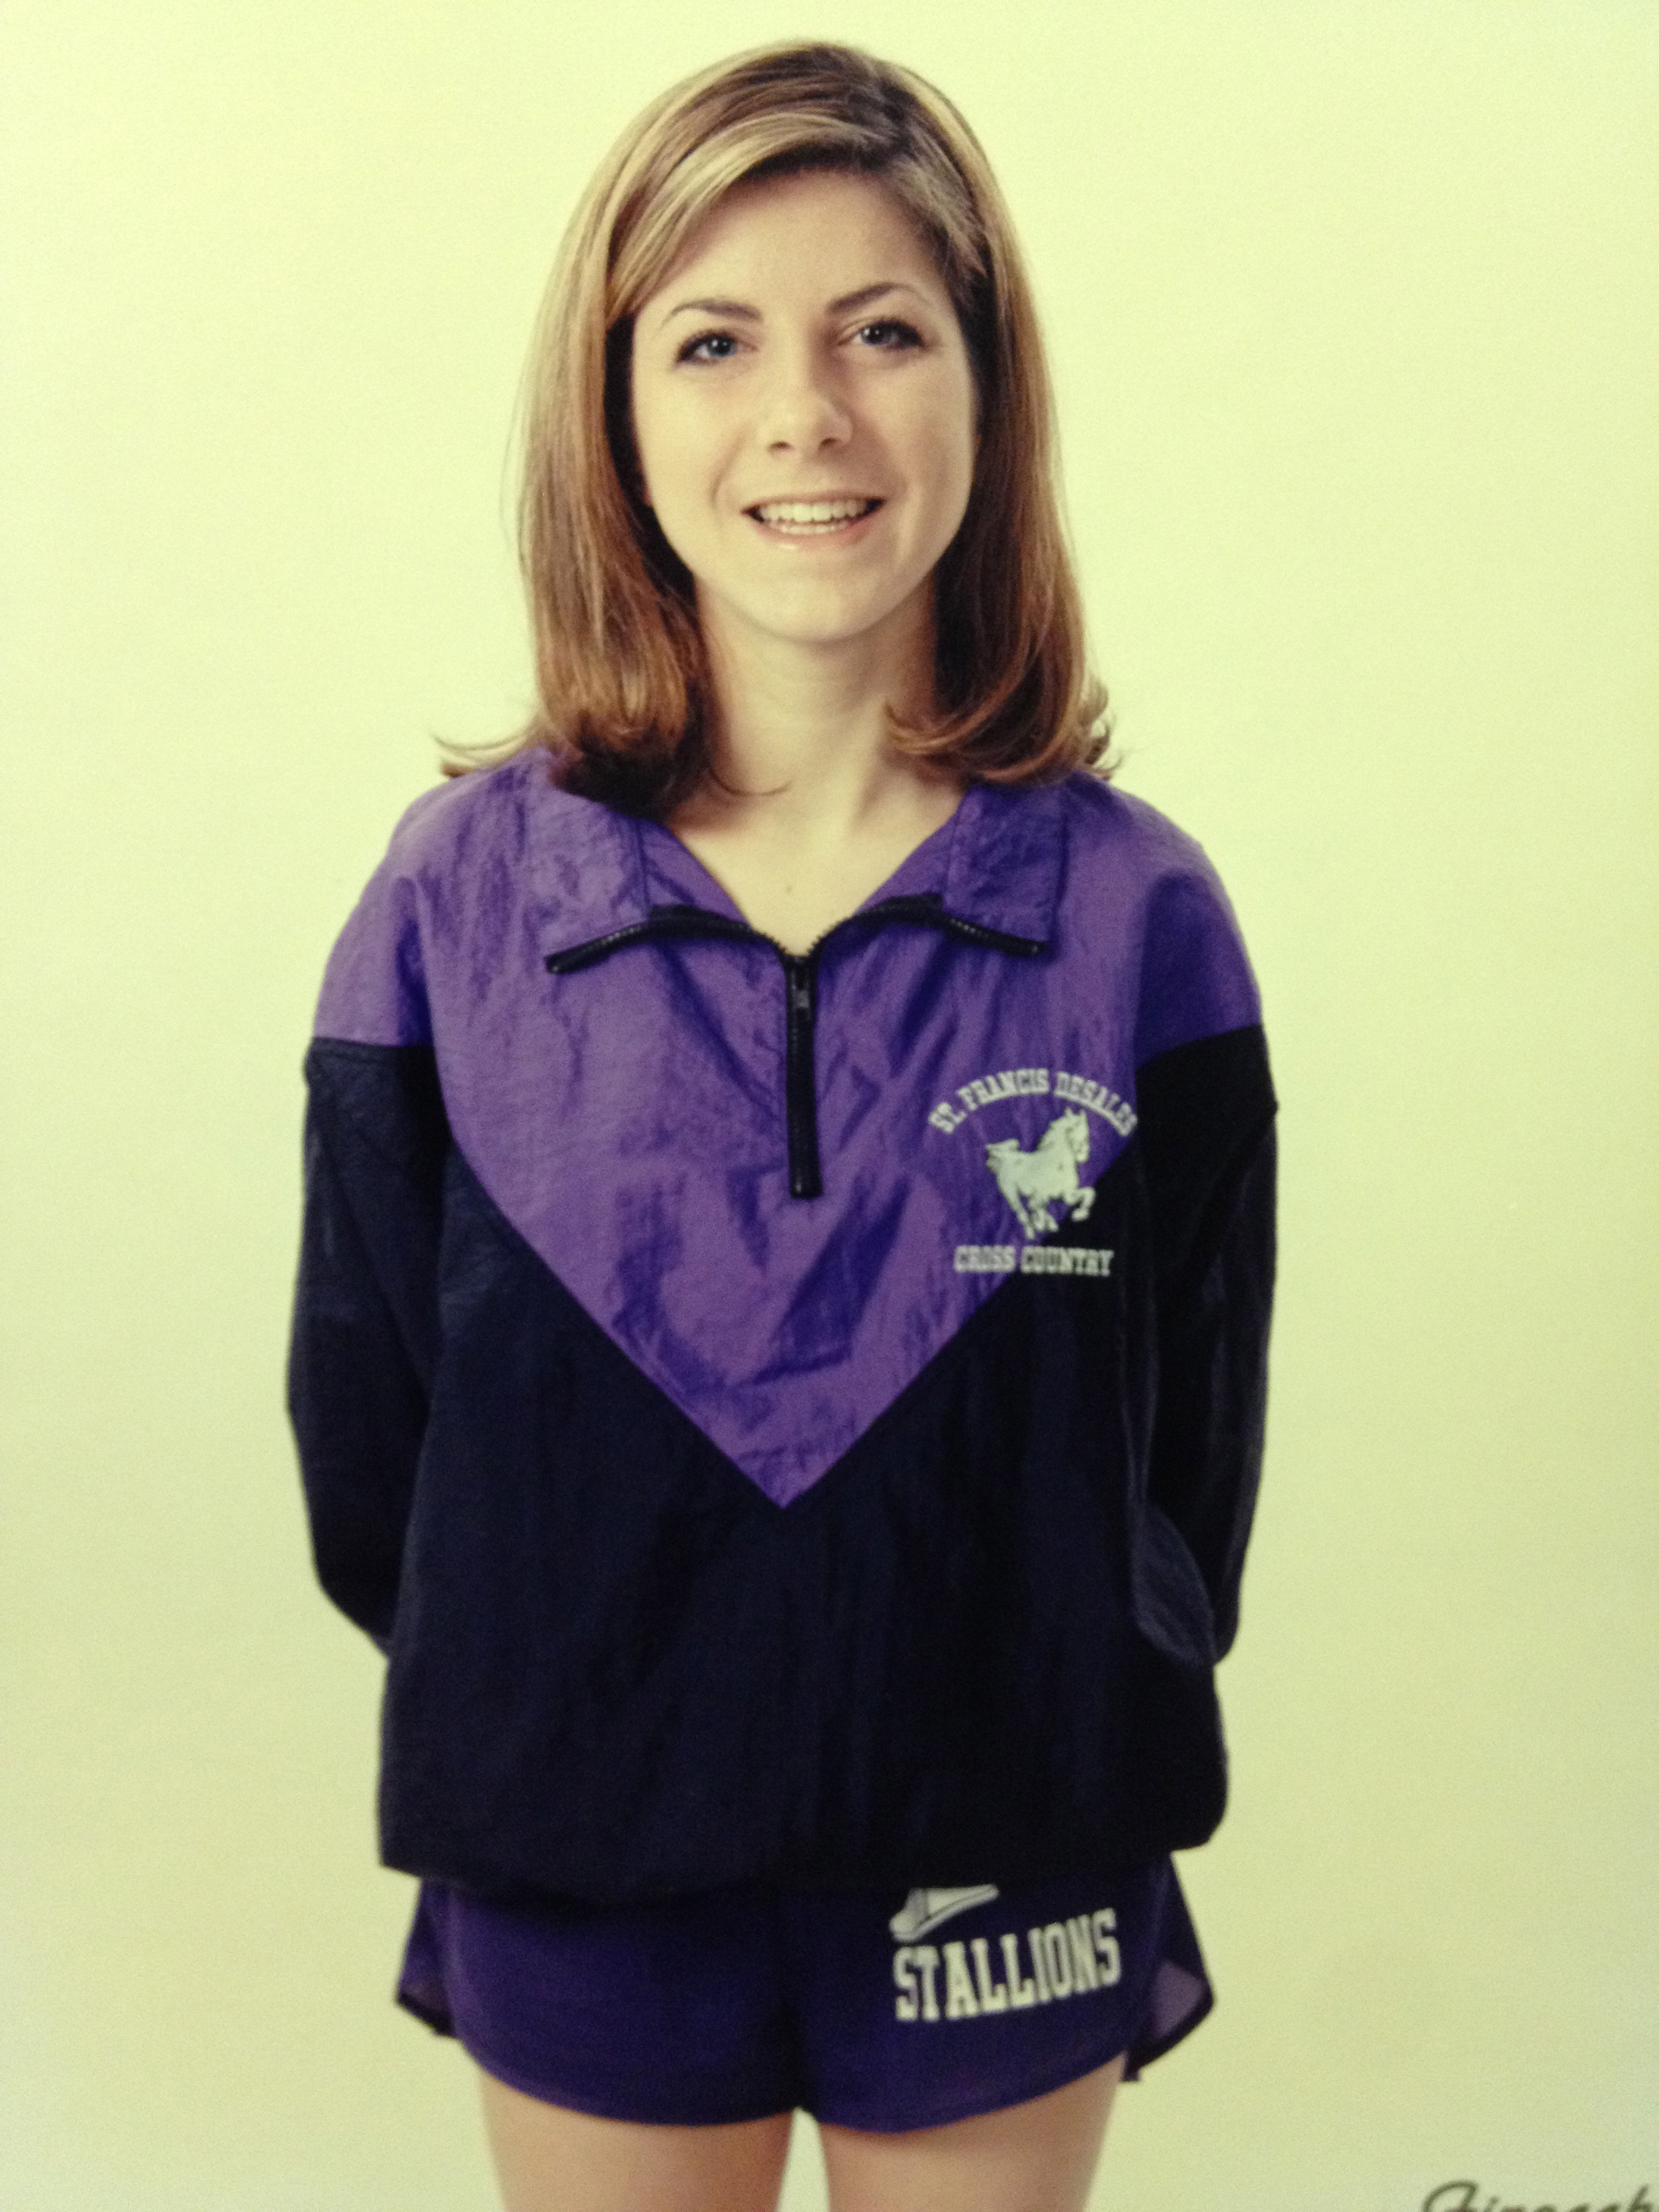 Angela Lucente 1995